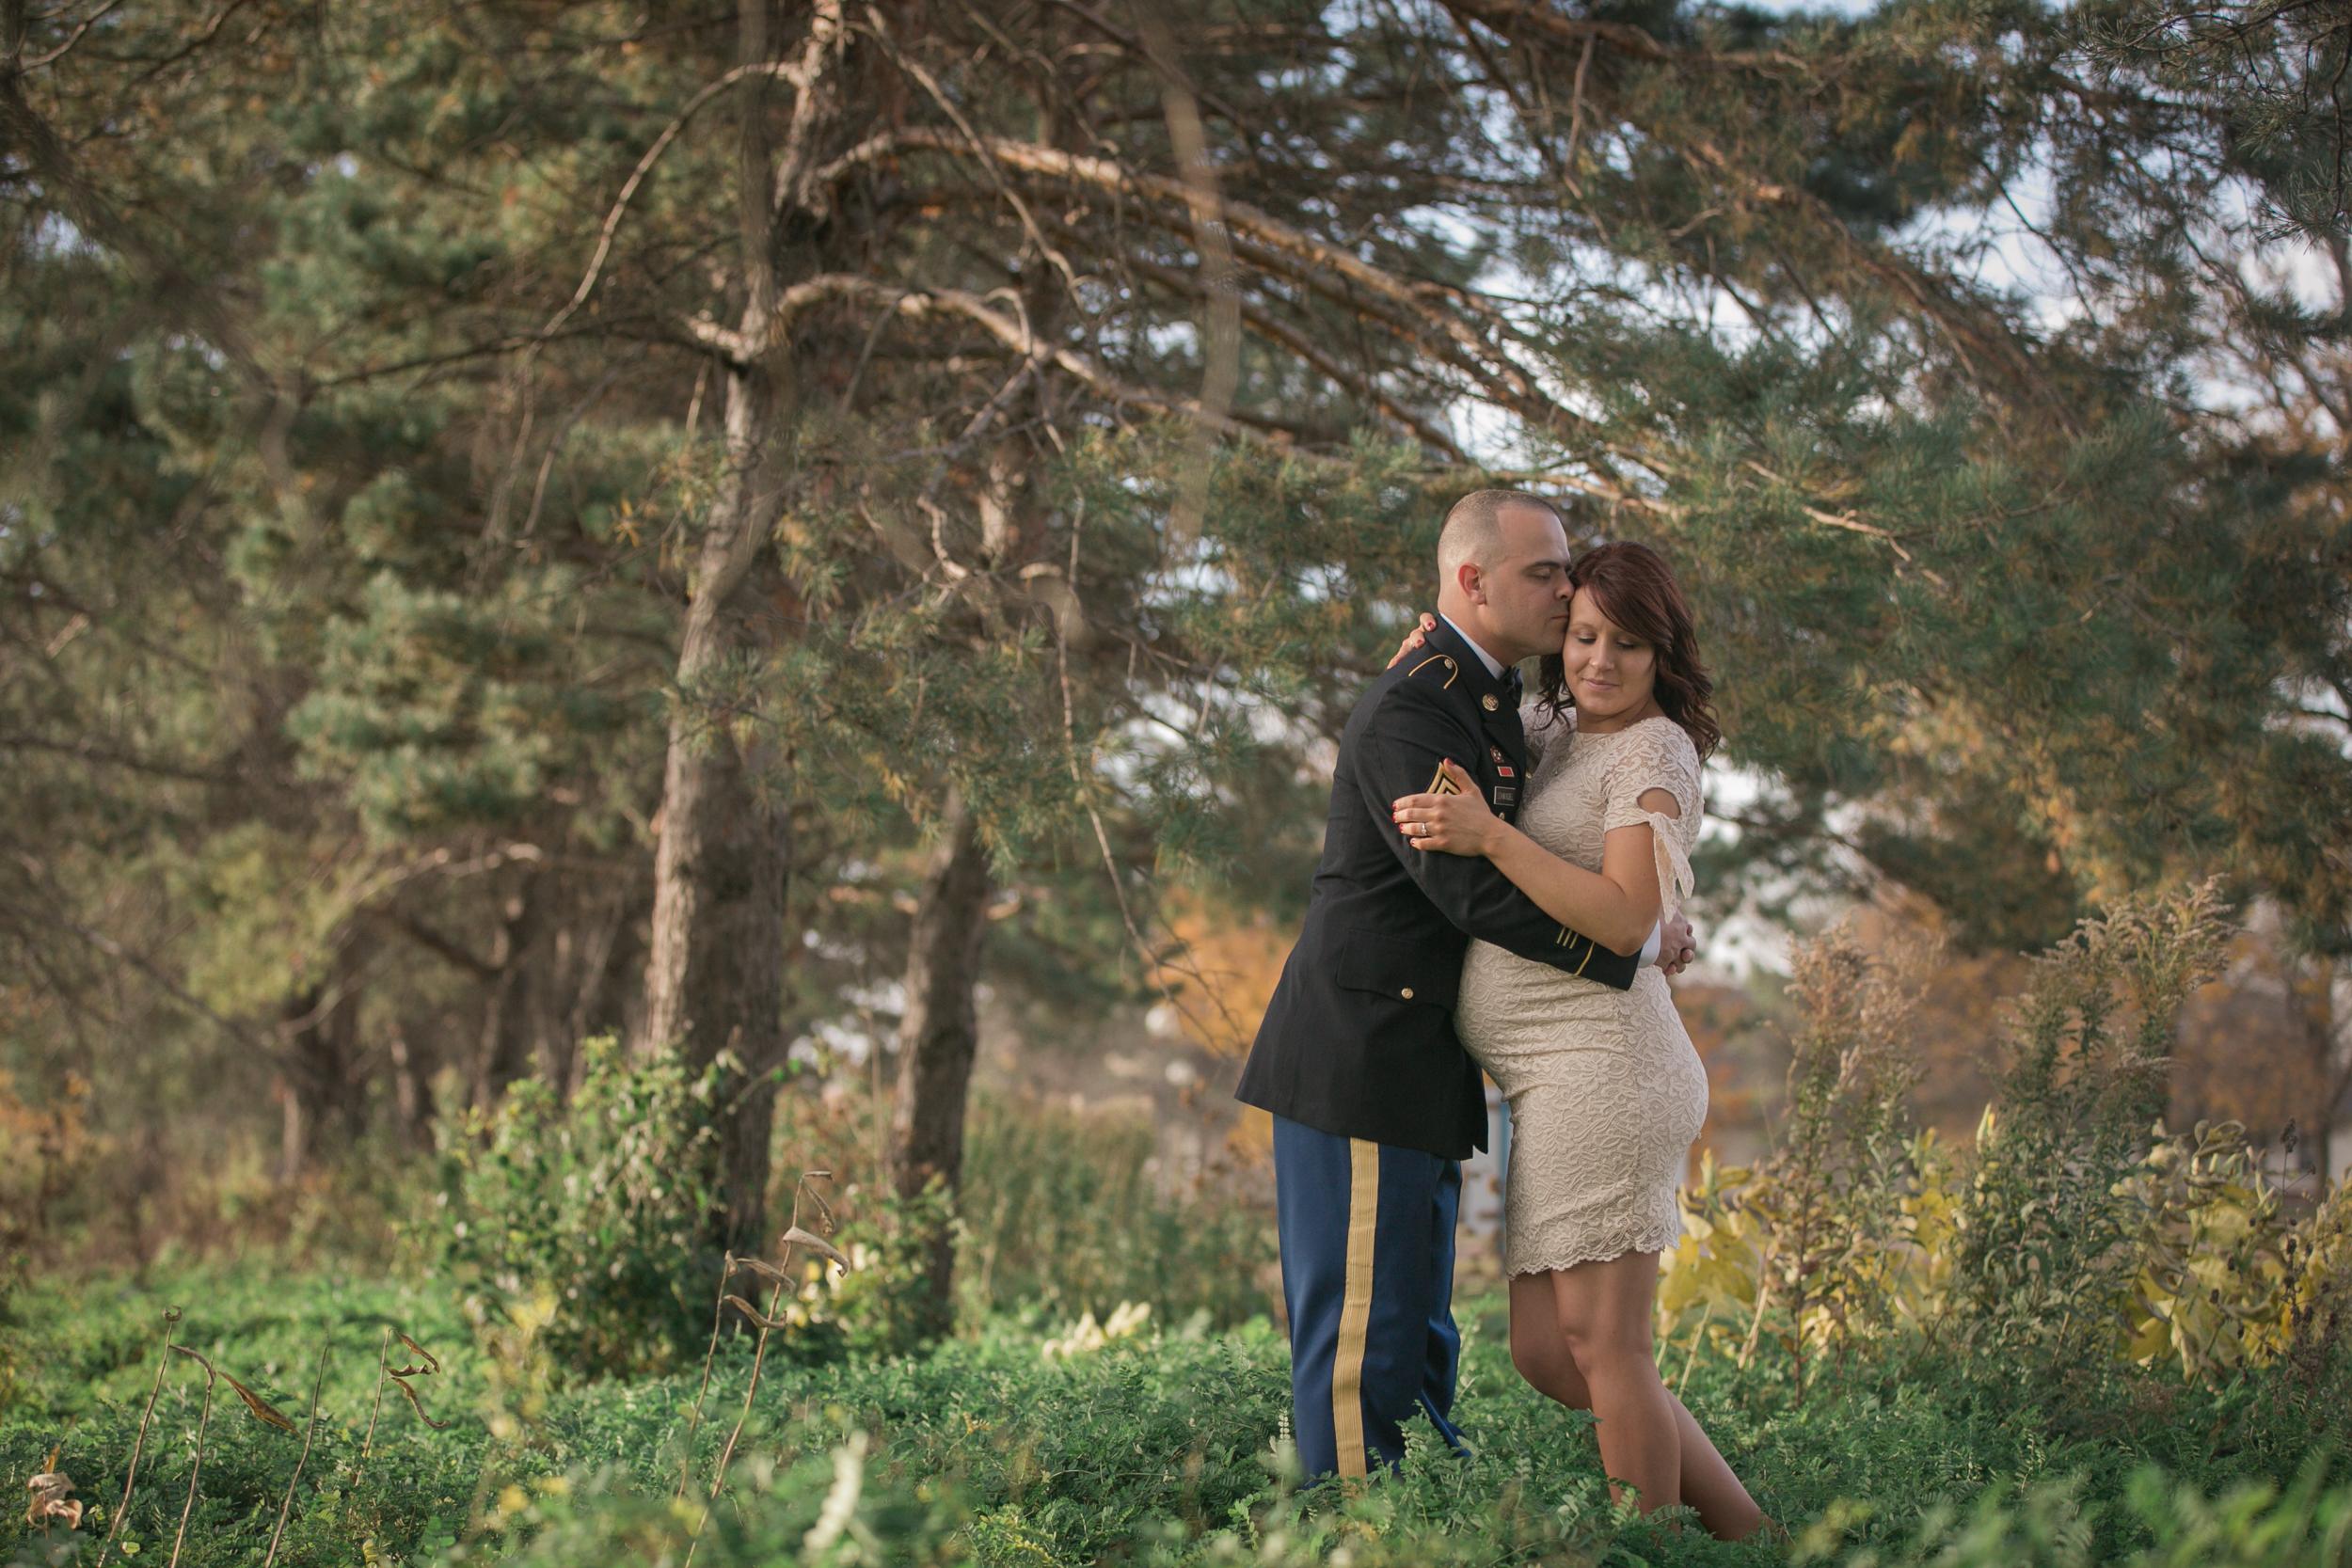 Fort Snelling Elopement St. Paul, MN, Fort Snelling Elopement, Military Elopement, Intimate Military Wedding, intimate elopement wedding-www.rachelsmak.com14.jpg